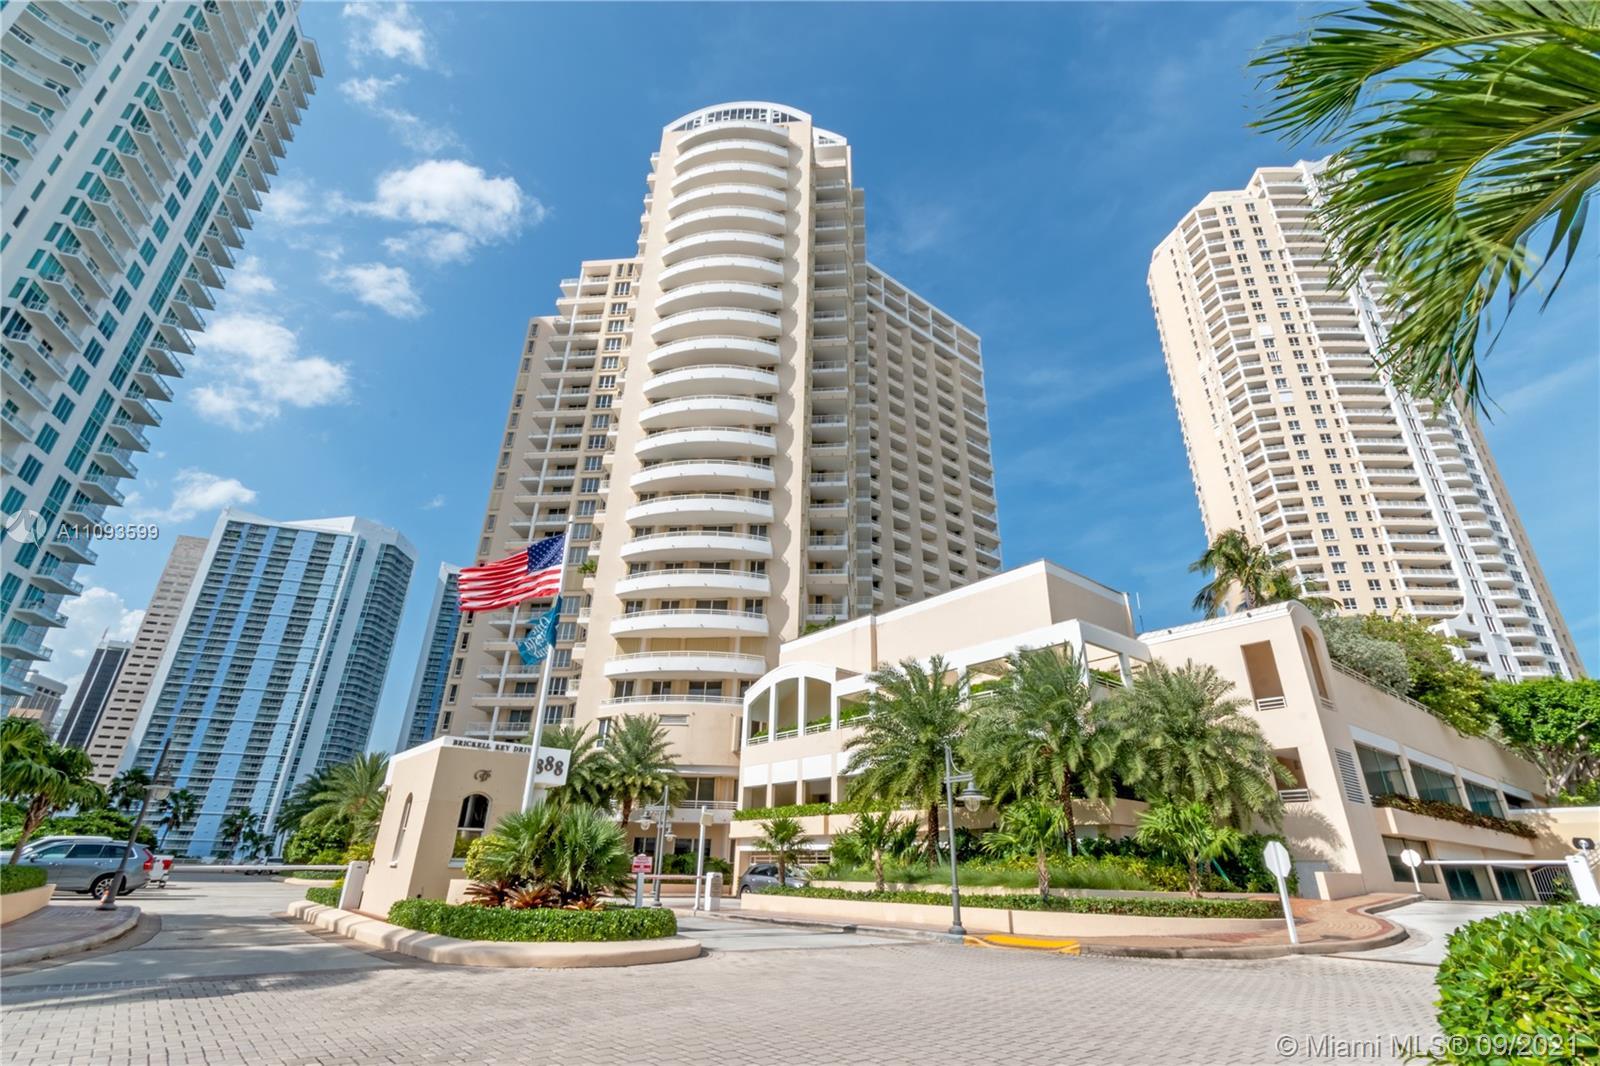 One Tequesta Point #1207 - 888 Brickell Key Dr #1207, Miami, FL 33131